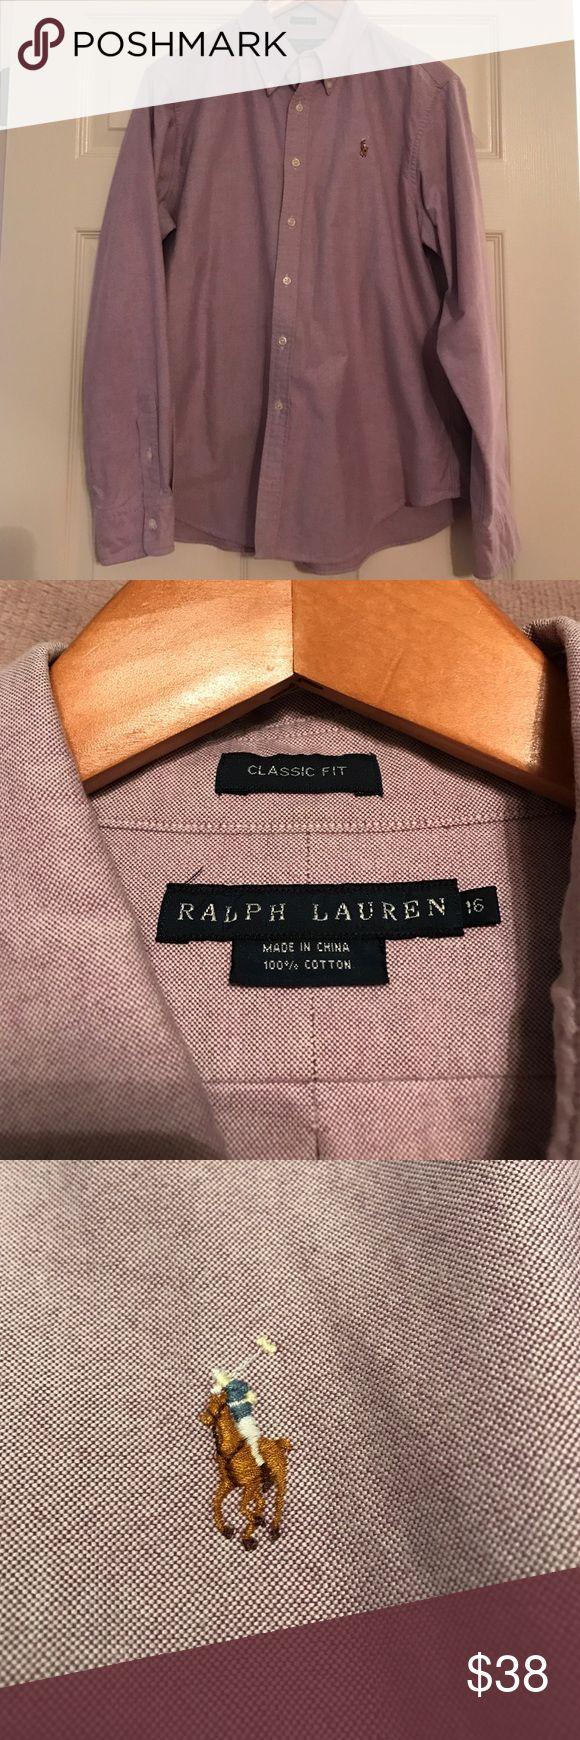 Ralph Lauren Oxford - light purple Light purple Ralph Lauren oxford shirt, women's size 16. Excellent condition. Let me know if you have any questions! Ralph Lauren Tops Button Down Shirts